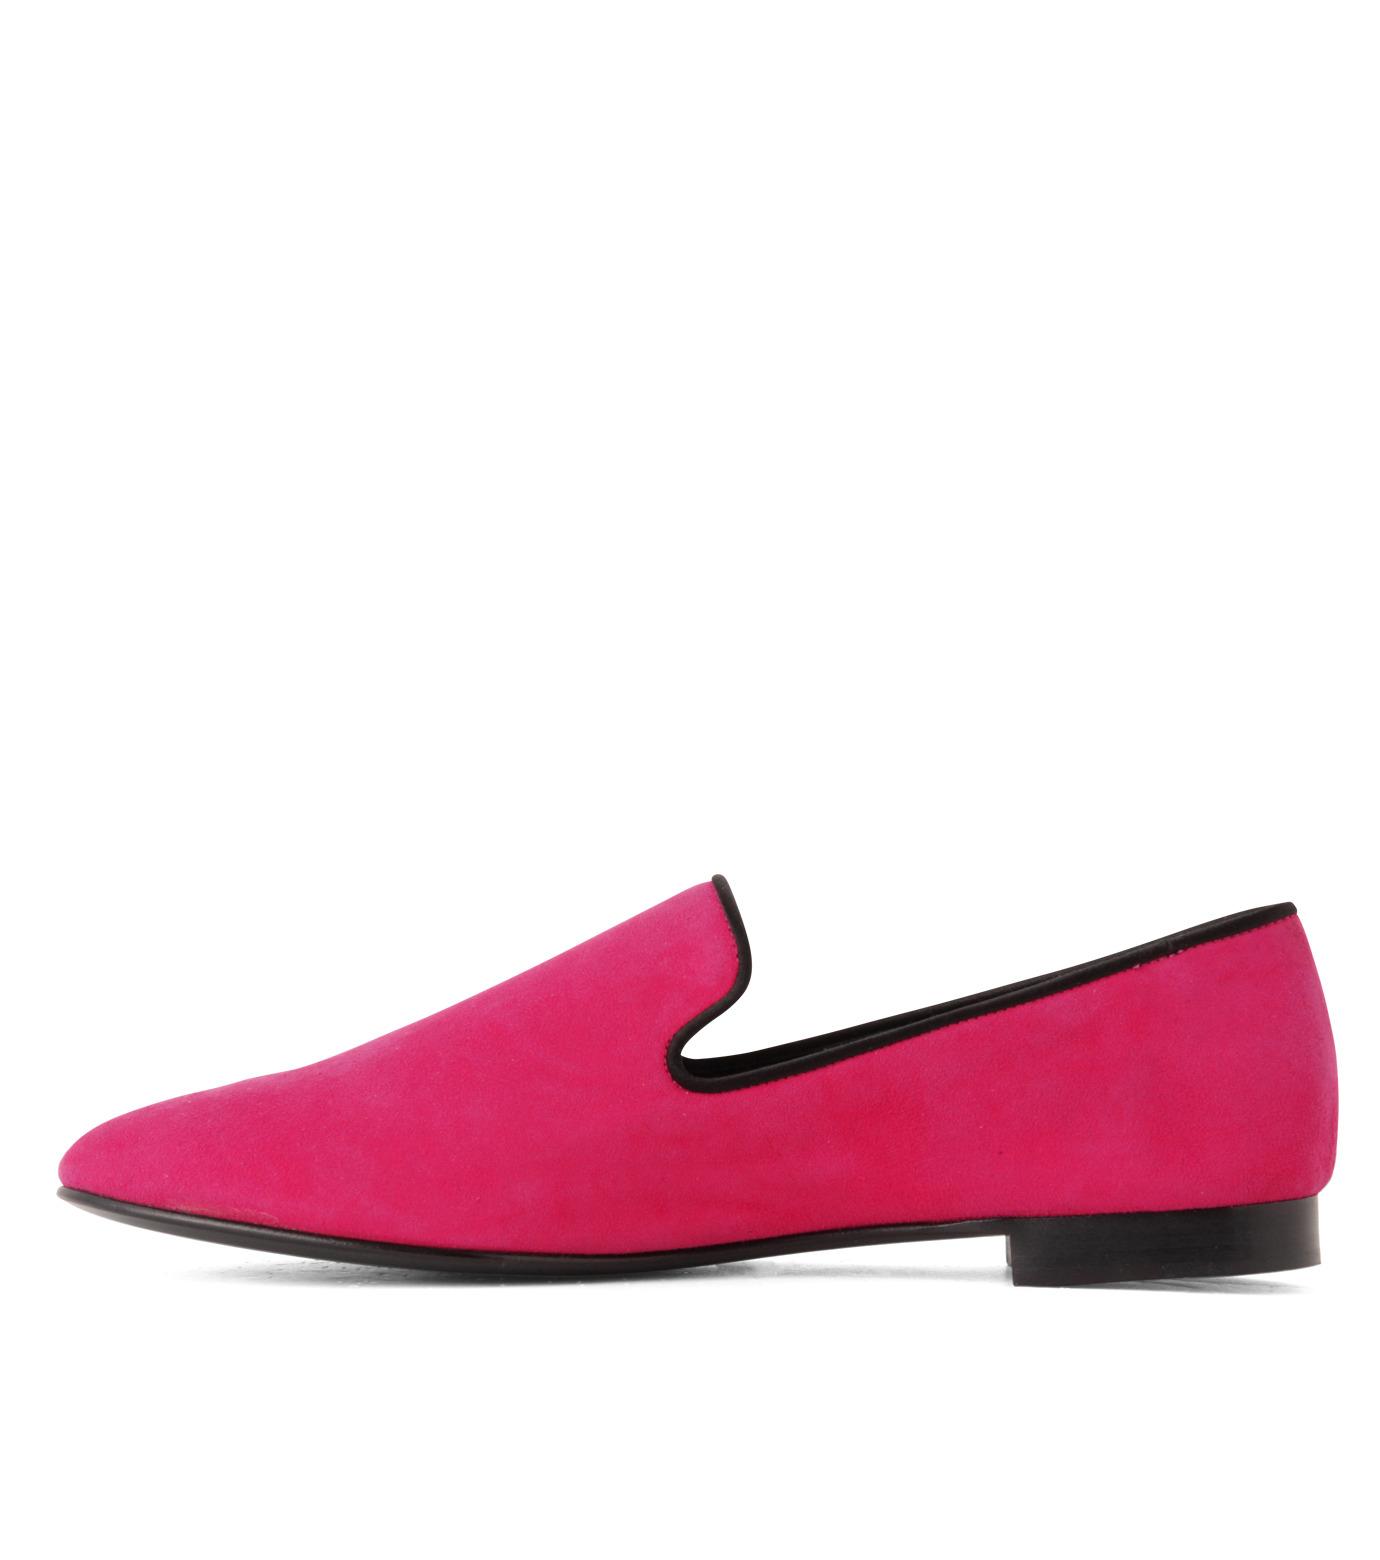 Giuseppe Zanotti Design(ジュゼッペザノッティ)のSuede Slipon-PINK(シューズ/shoes)-EU4010-CA5-72 拡大詳細画像2